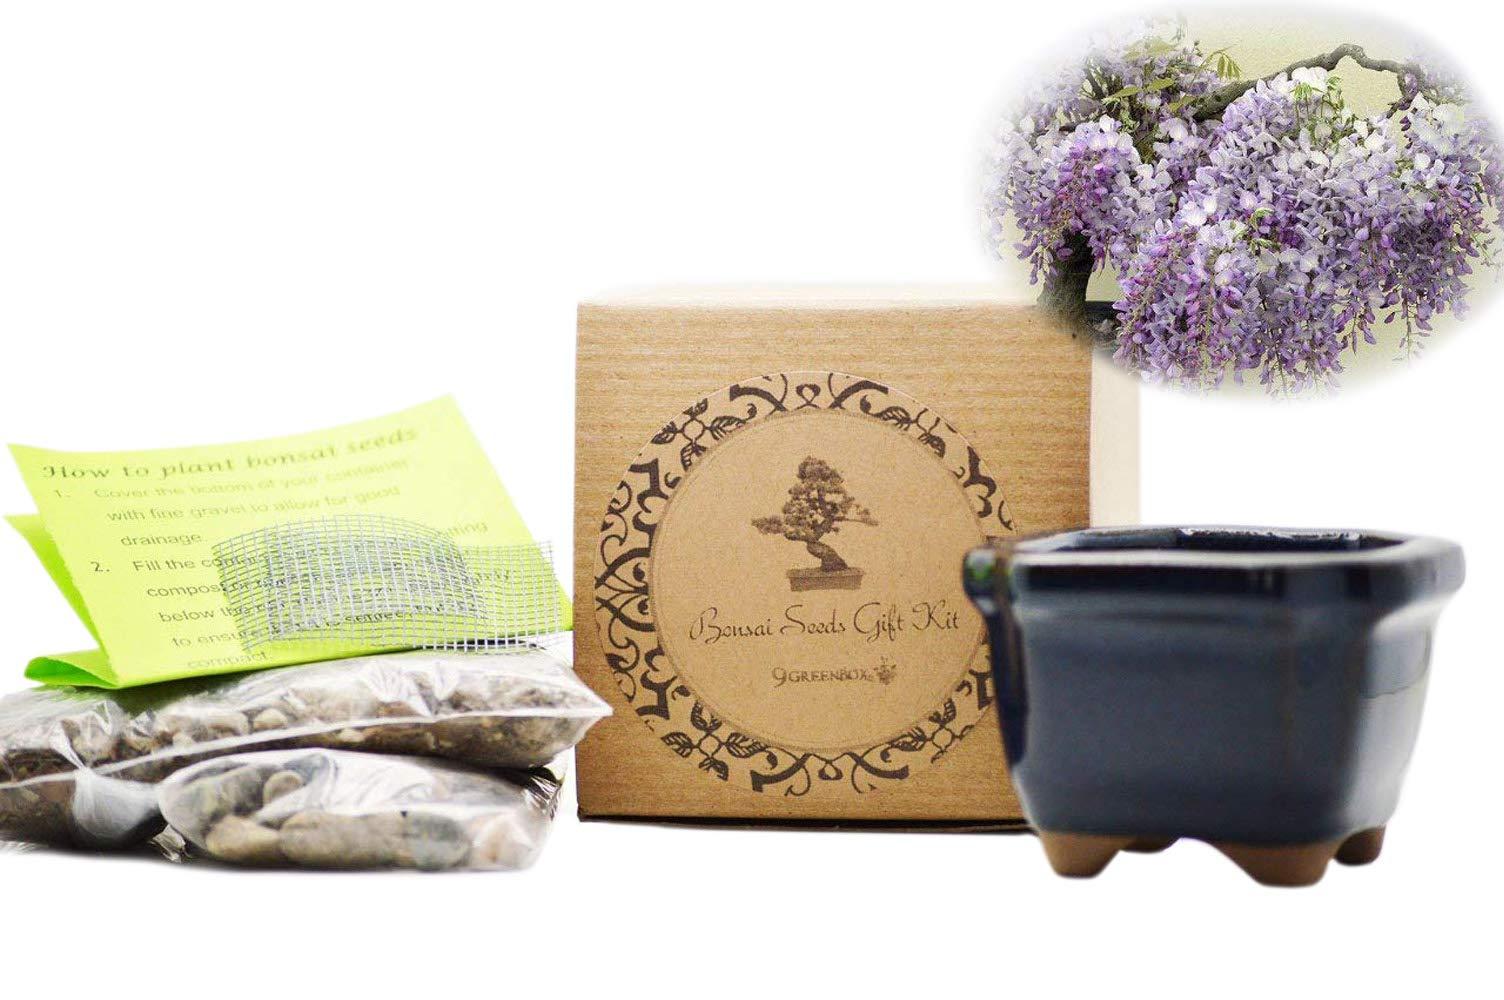 9GreenBox - Chinese Blue Wisteria Bonsai Seed Kit by 9GreenBox